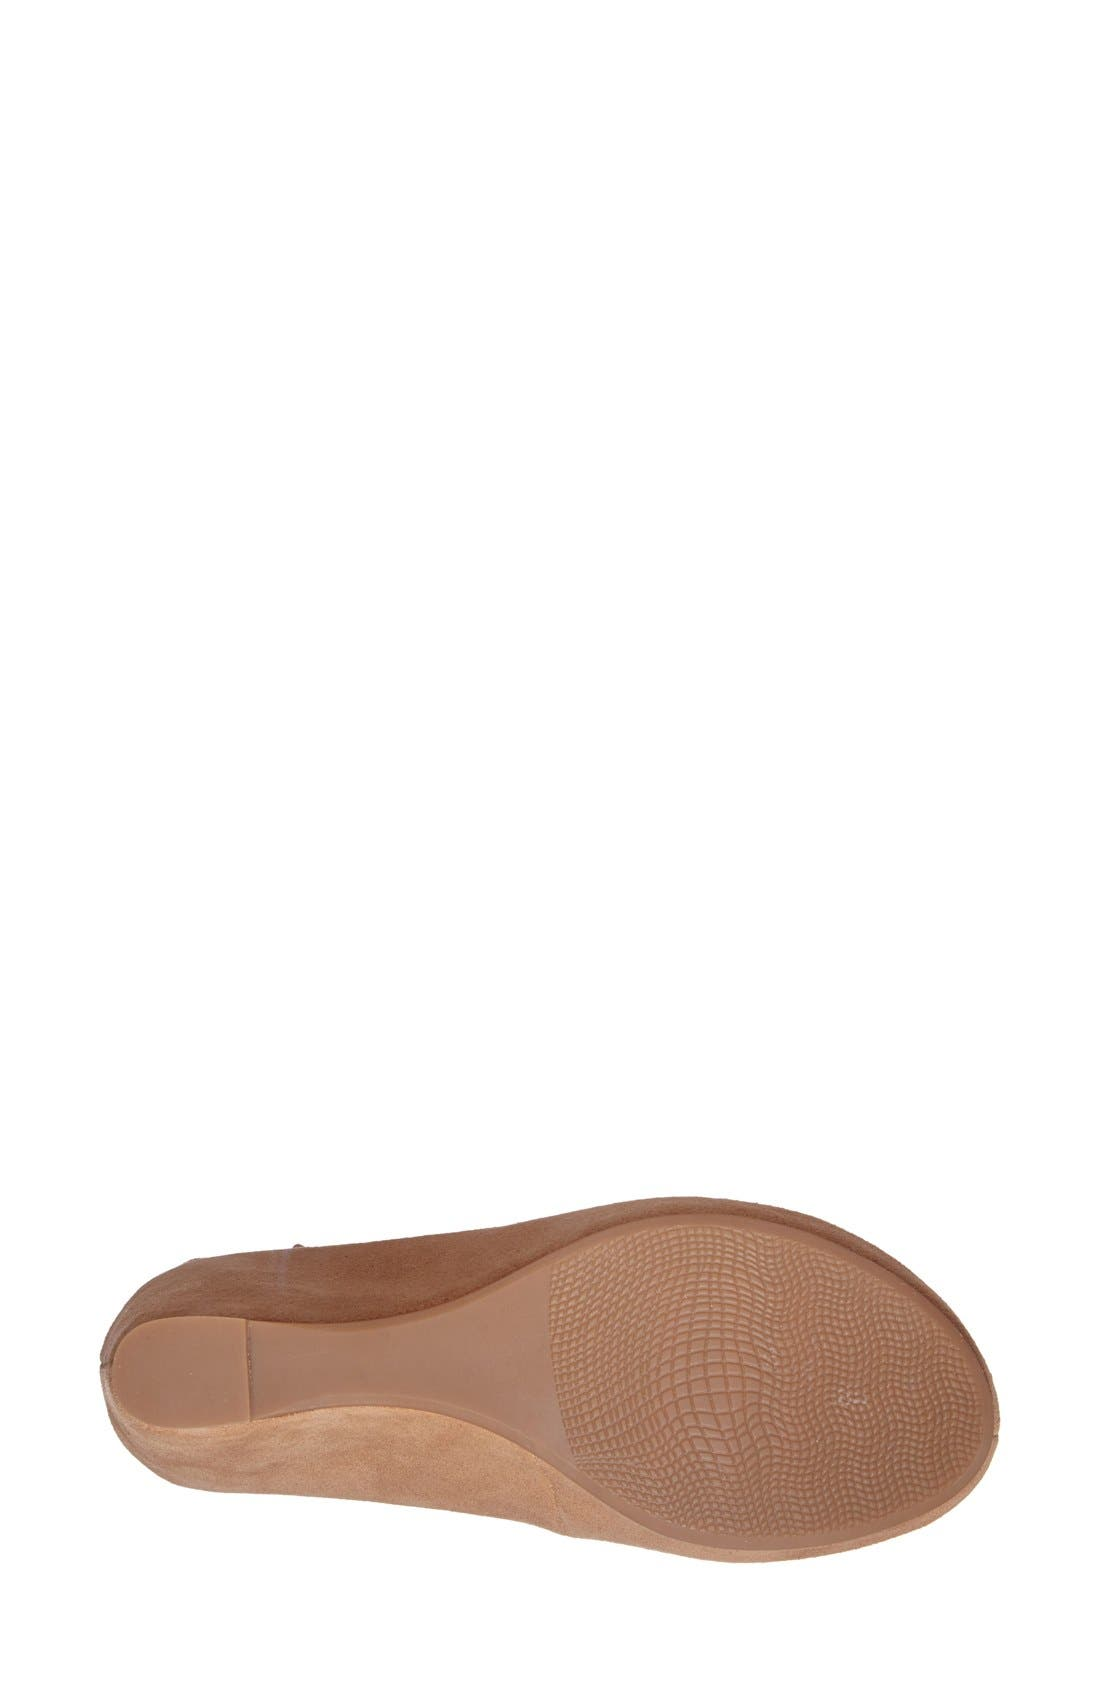 Alternate Image 4  - Johnston & Murphy 'Tricia' Ankle Strap Sandal